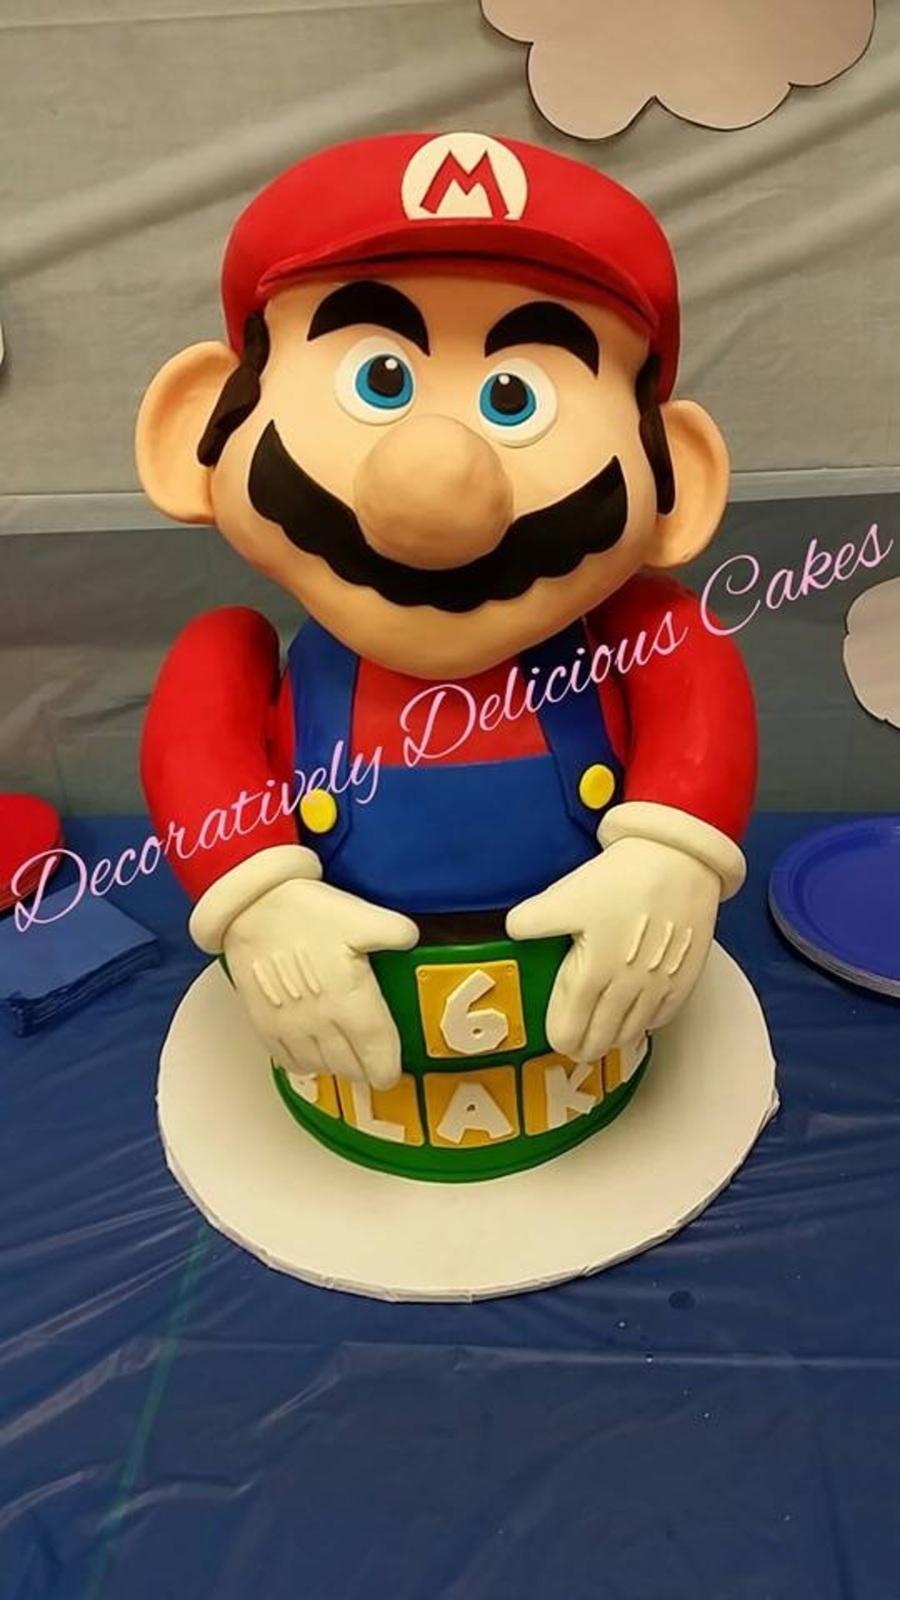 Tremendous Its Me Mario My Boys 6Th Birthday Cake Cakecentral Com Personalised Birthday Cards Veneteletsinfo